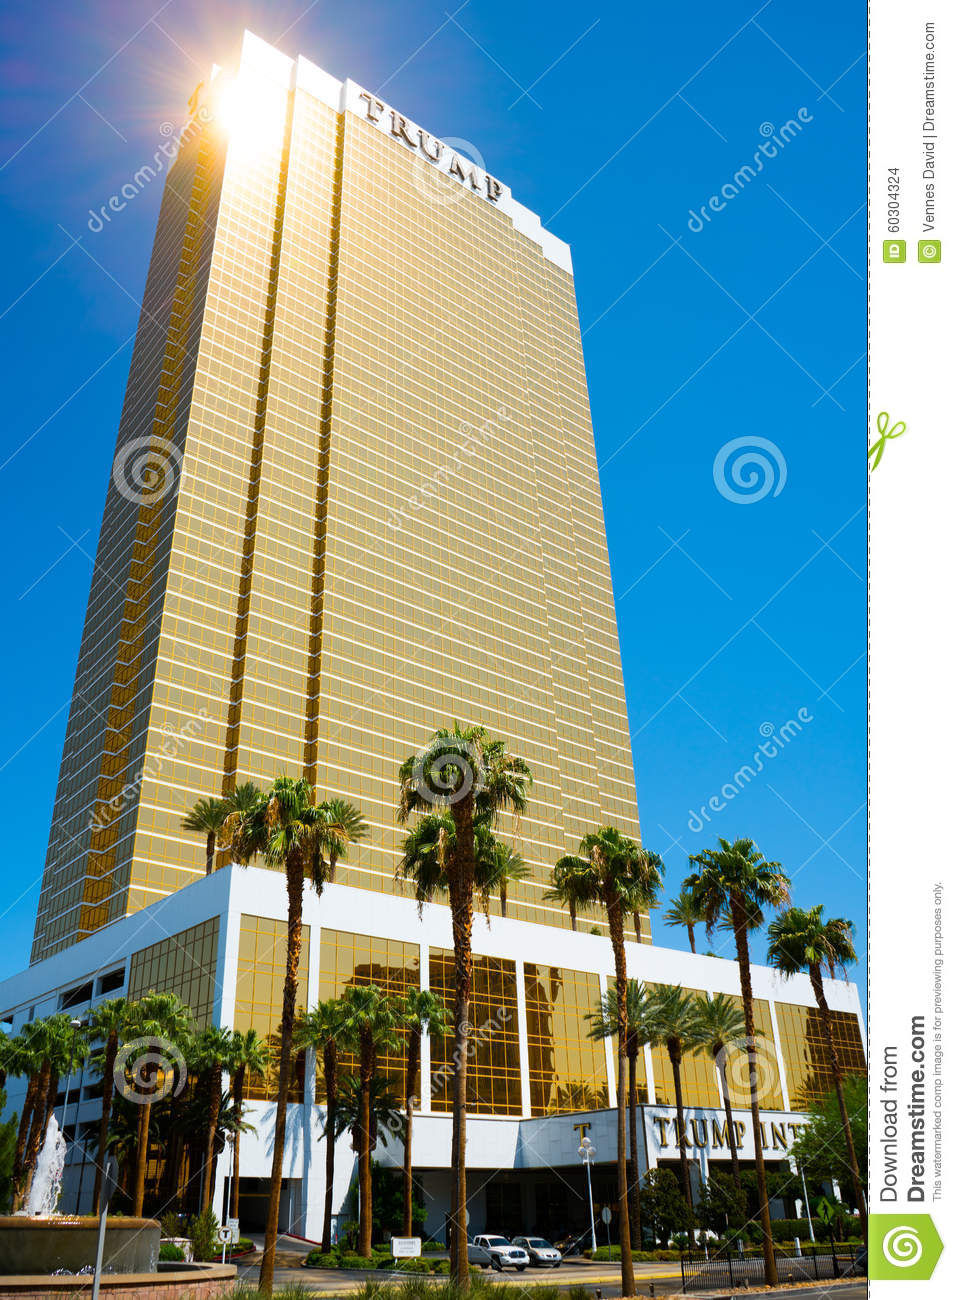 Trump International Hotel Las Vegas.